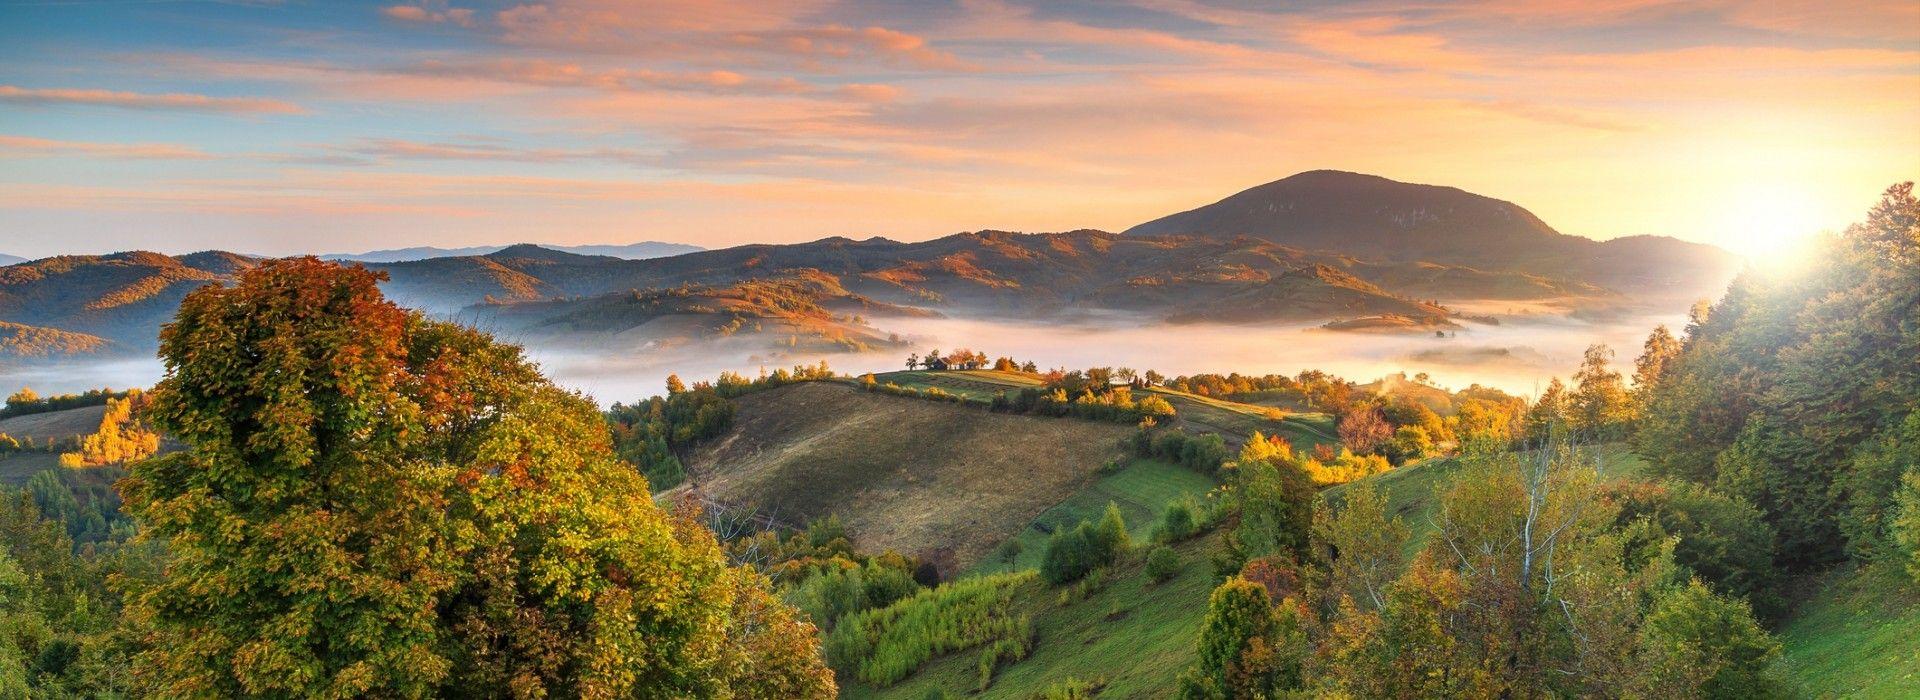 Luxury Tours in Eastern Europe